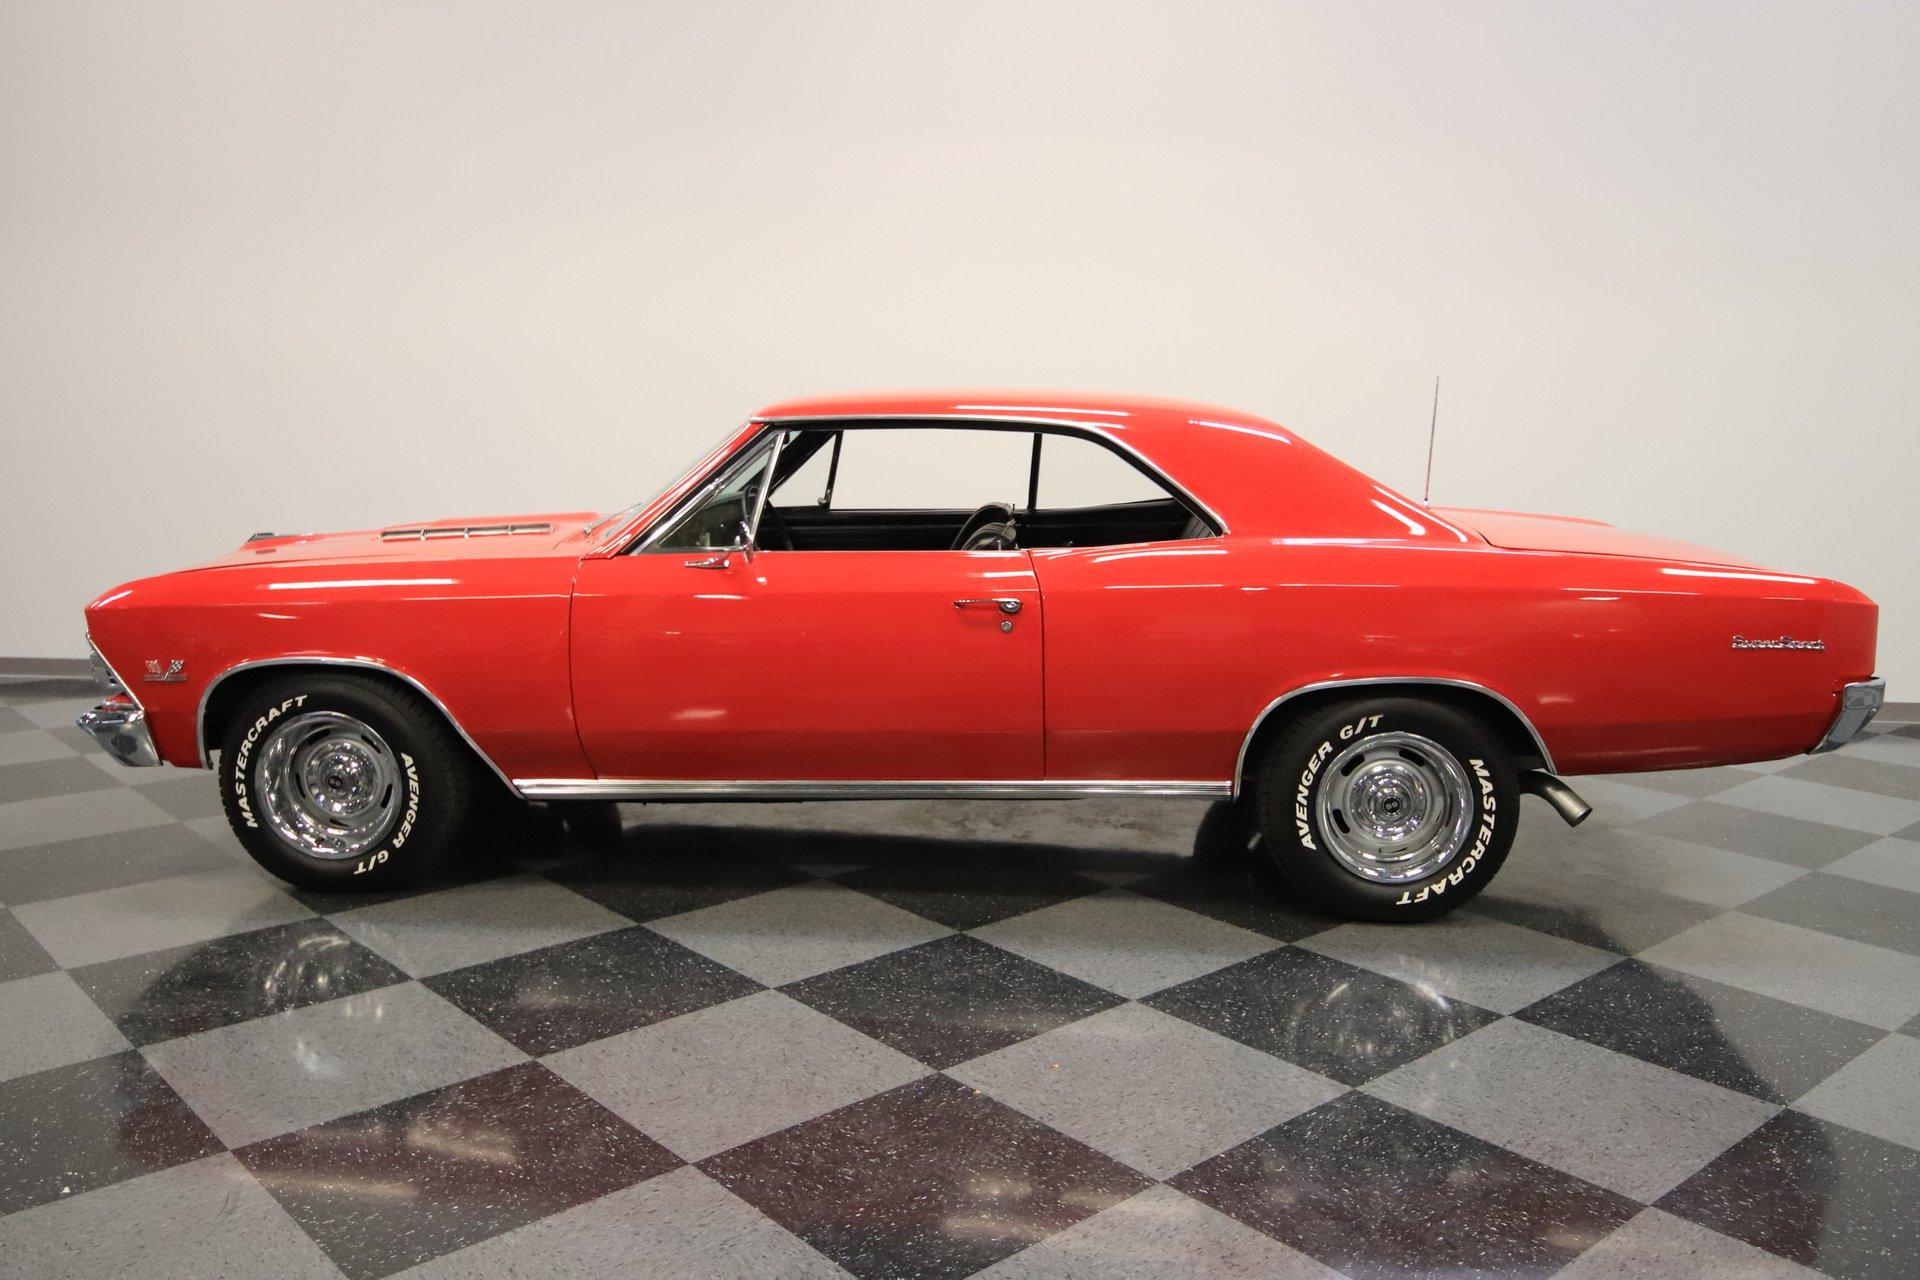 1966 chevrolet chevelle ss 427 tribute